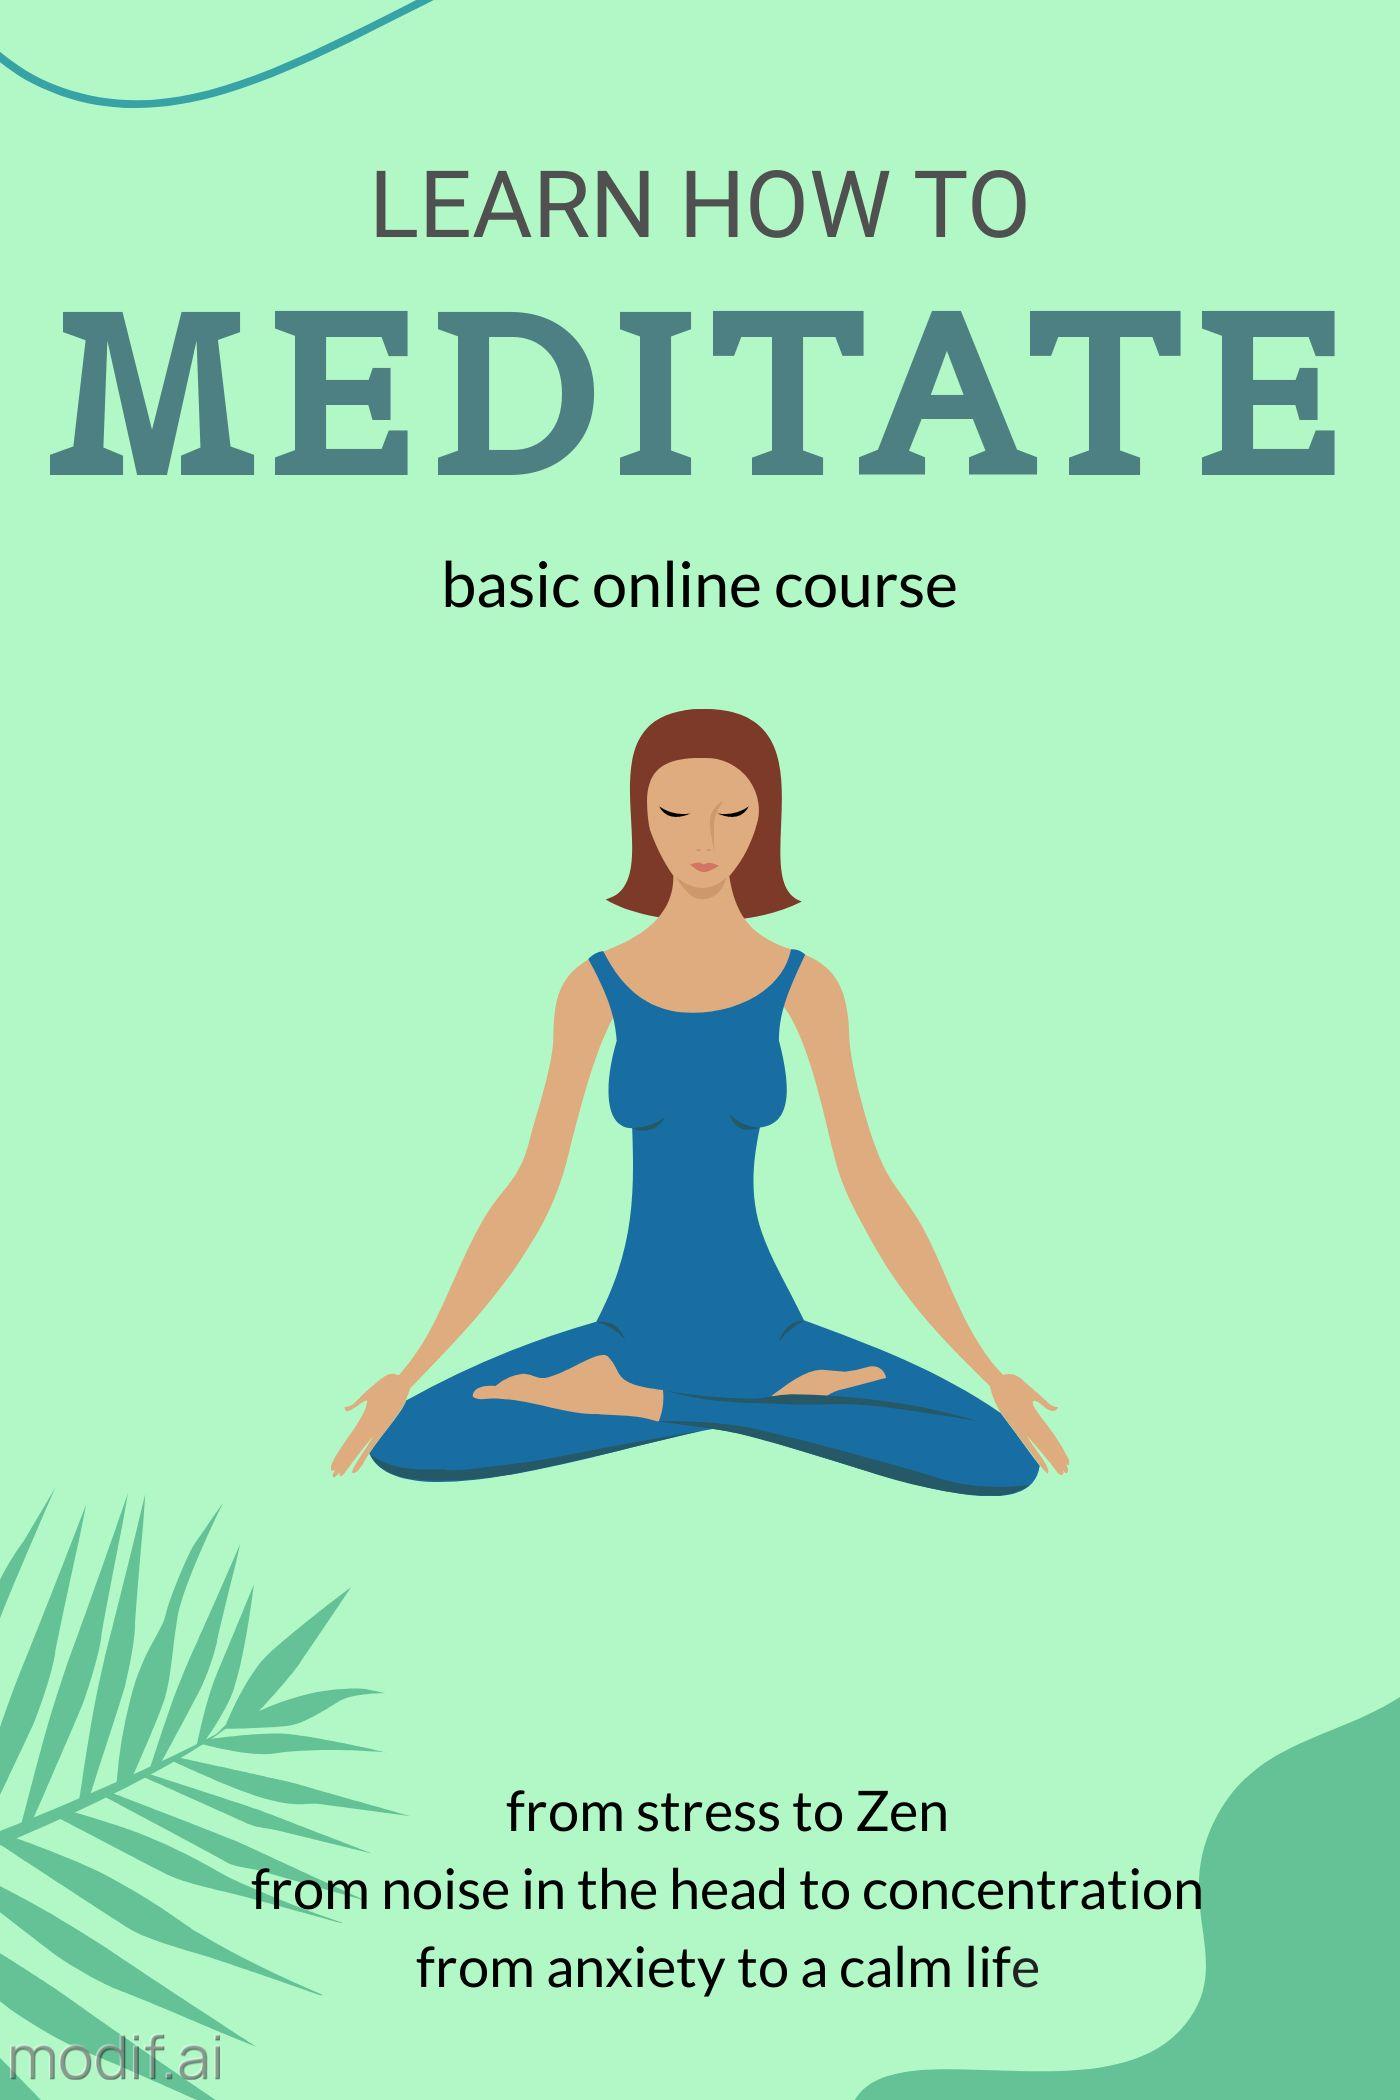 Online Meditation Course Template